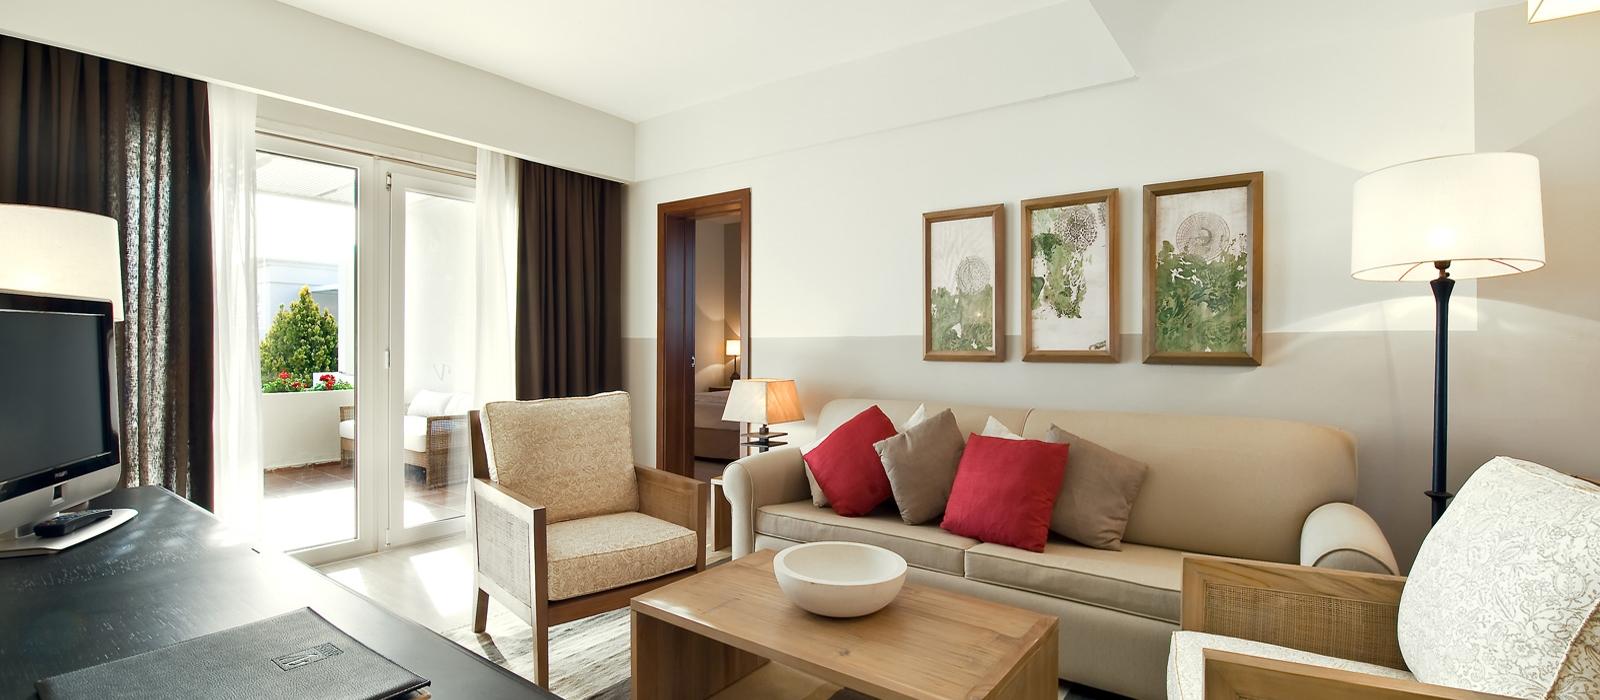 Camere Hotel Cadiz Costa Golf - Vincci Hoteles - Suite